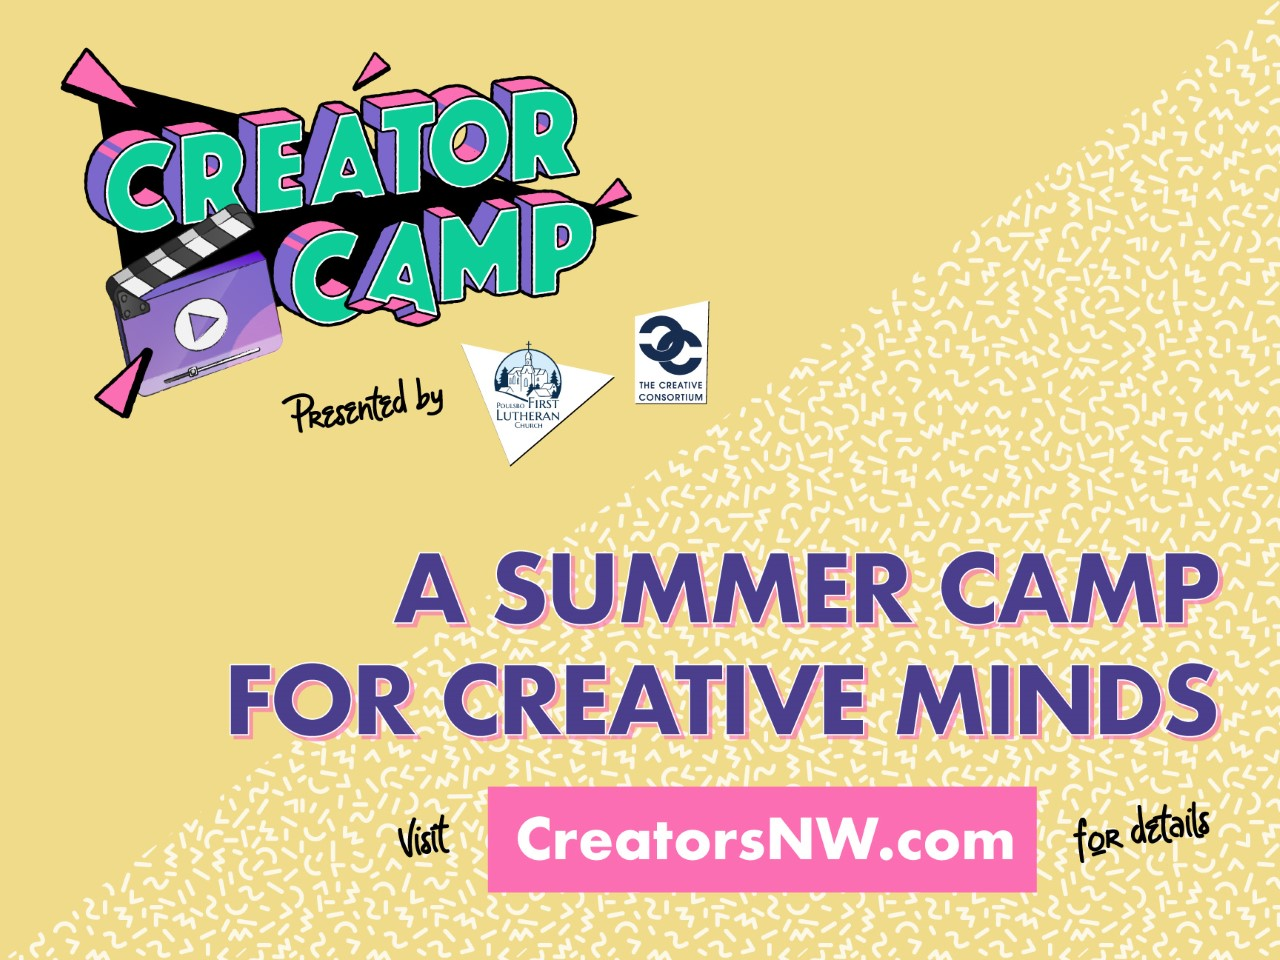 Creator Camp logo